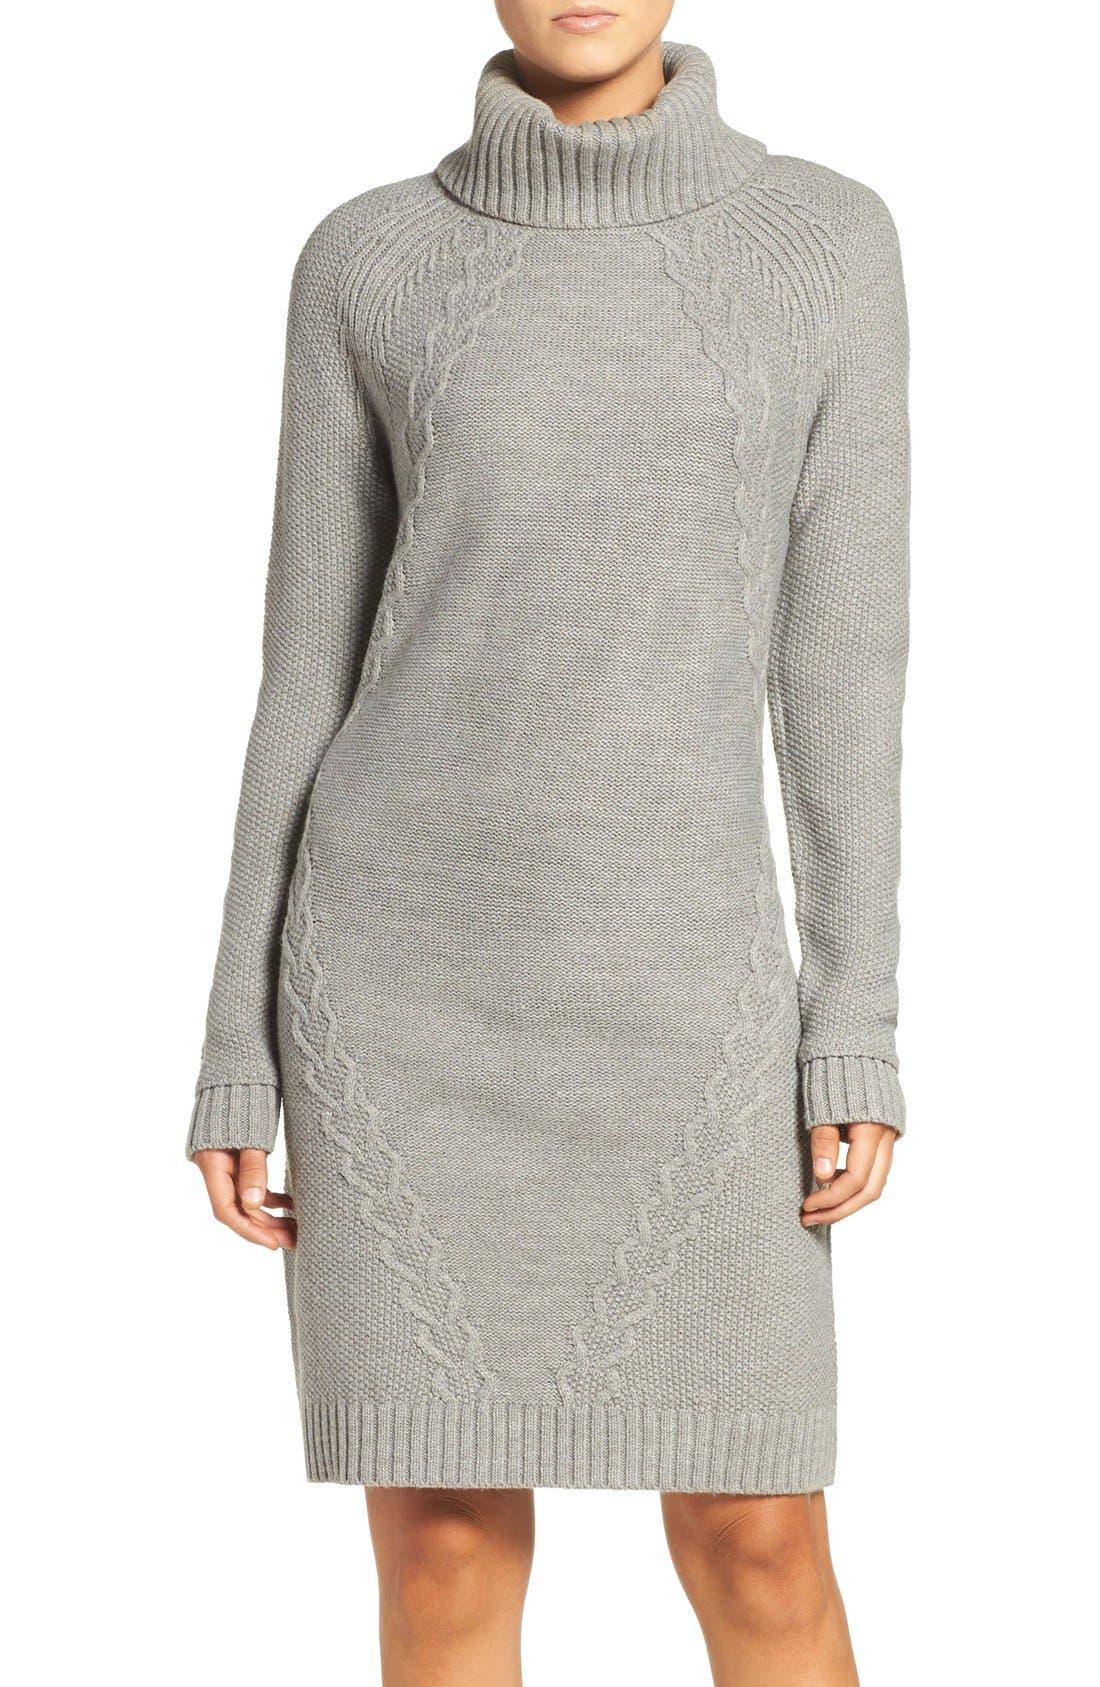 Main Image - Eliza J Cable Knit Sweater Dress (Regular & Petite)